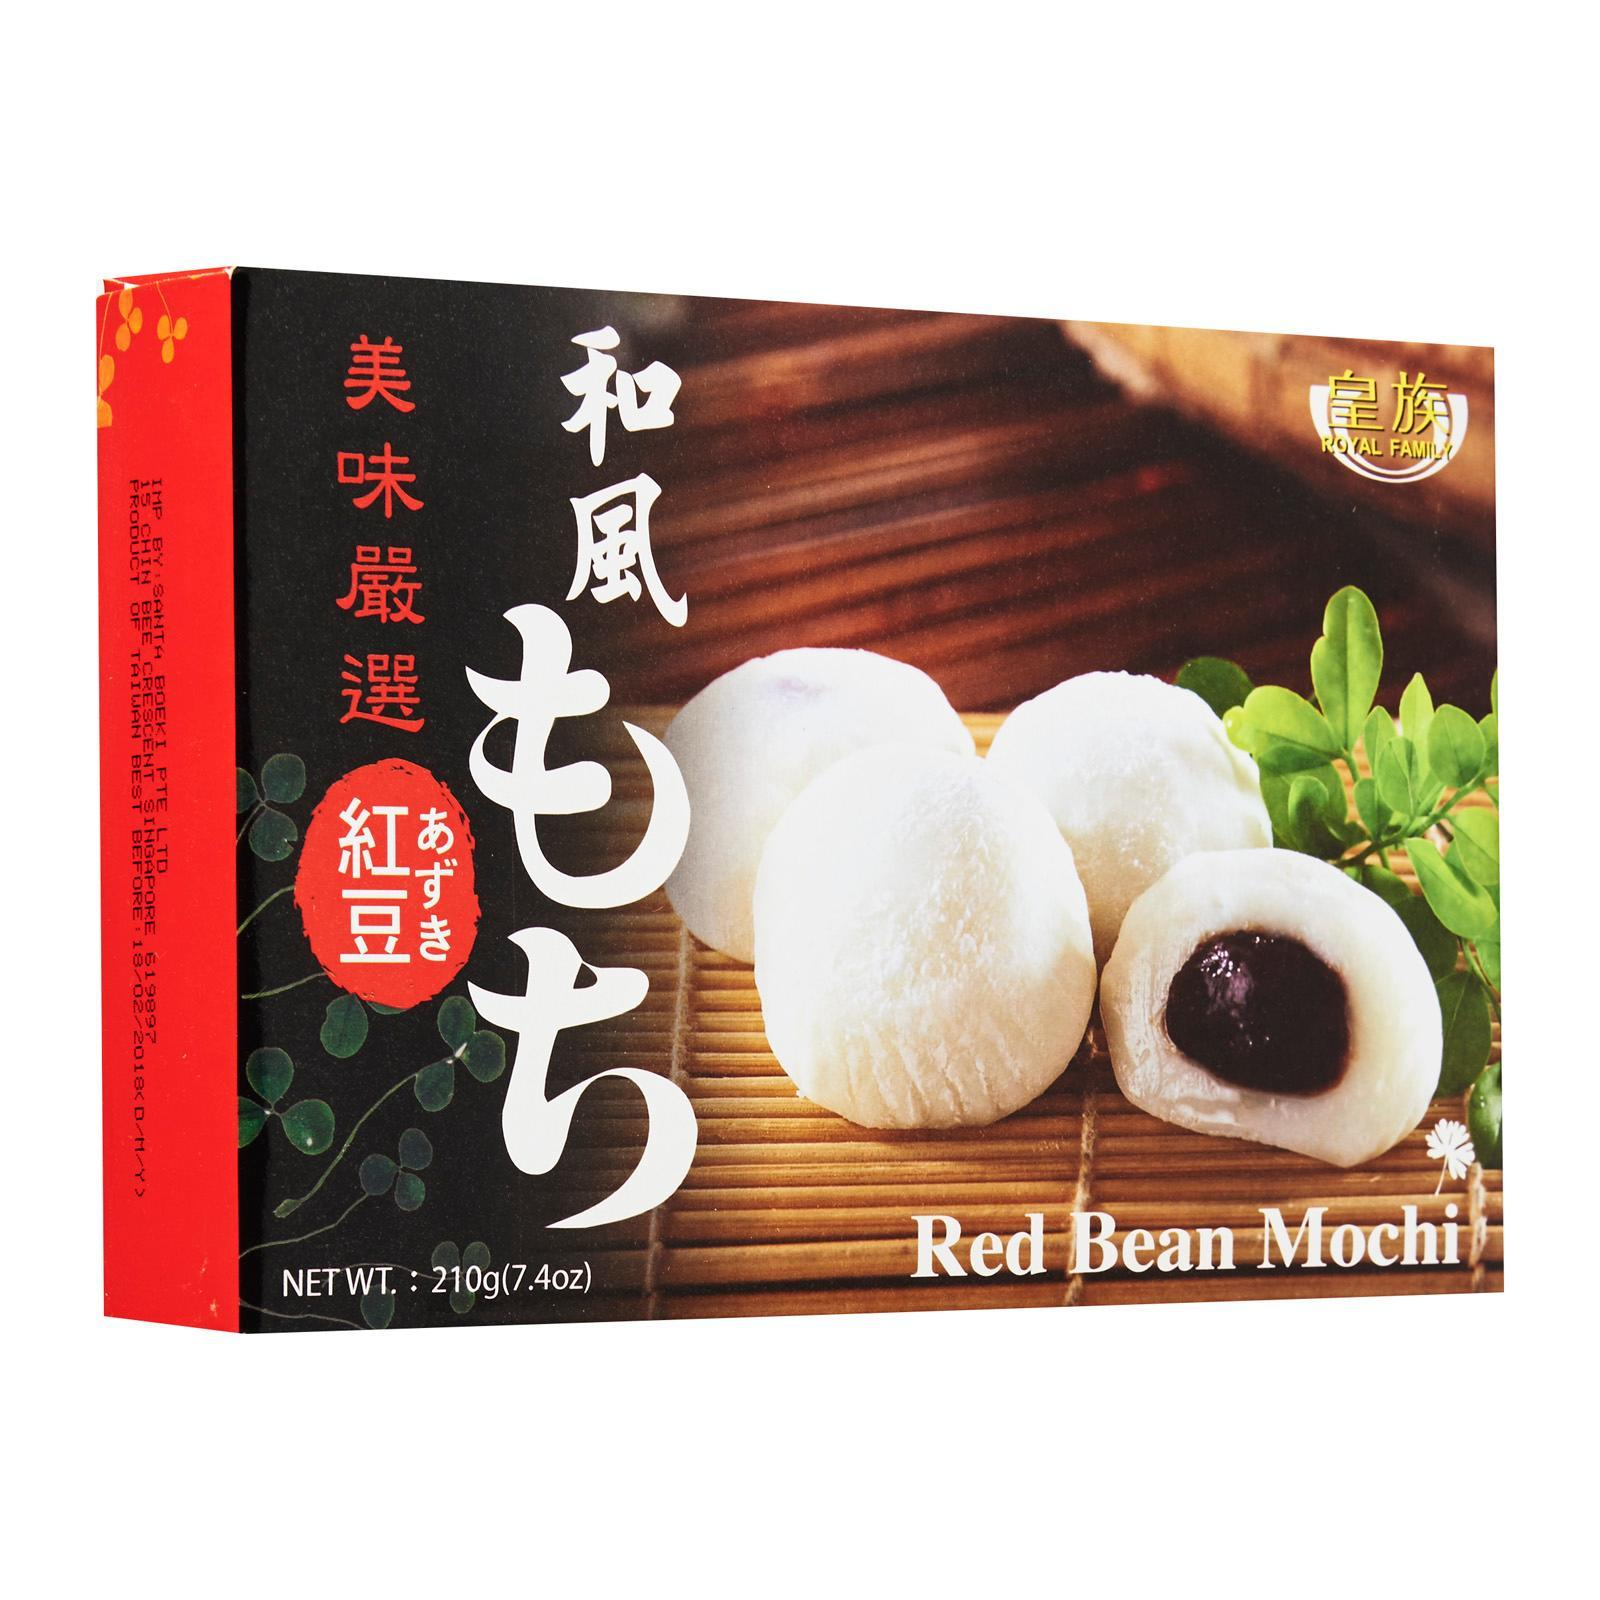 Royal Family Red Bean Mochi Sweet - By Prestigio Delights